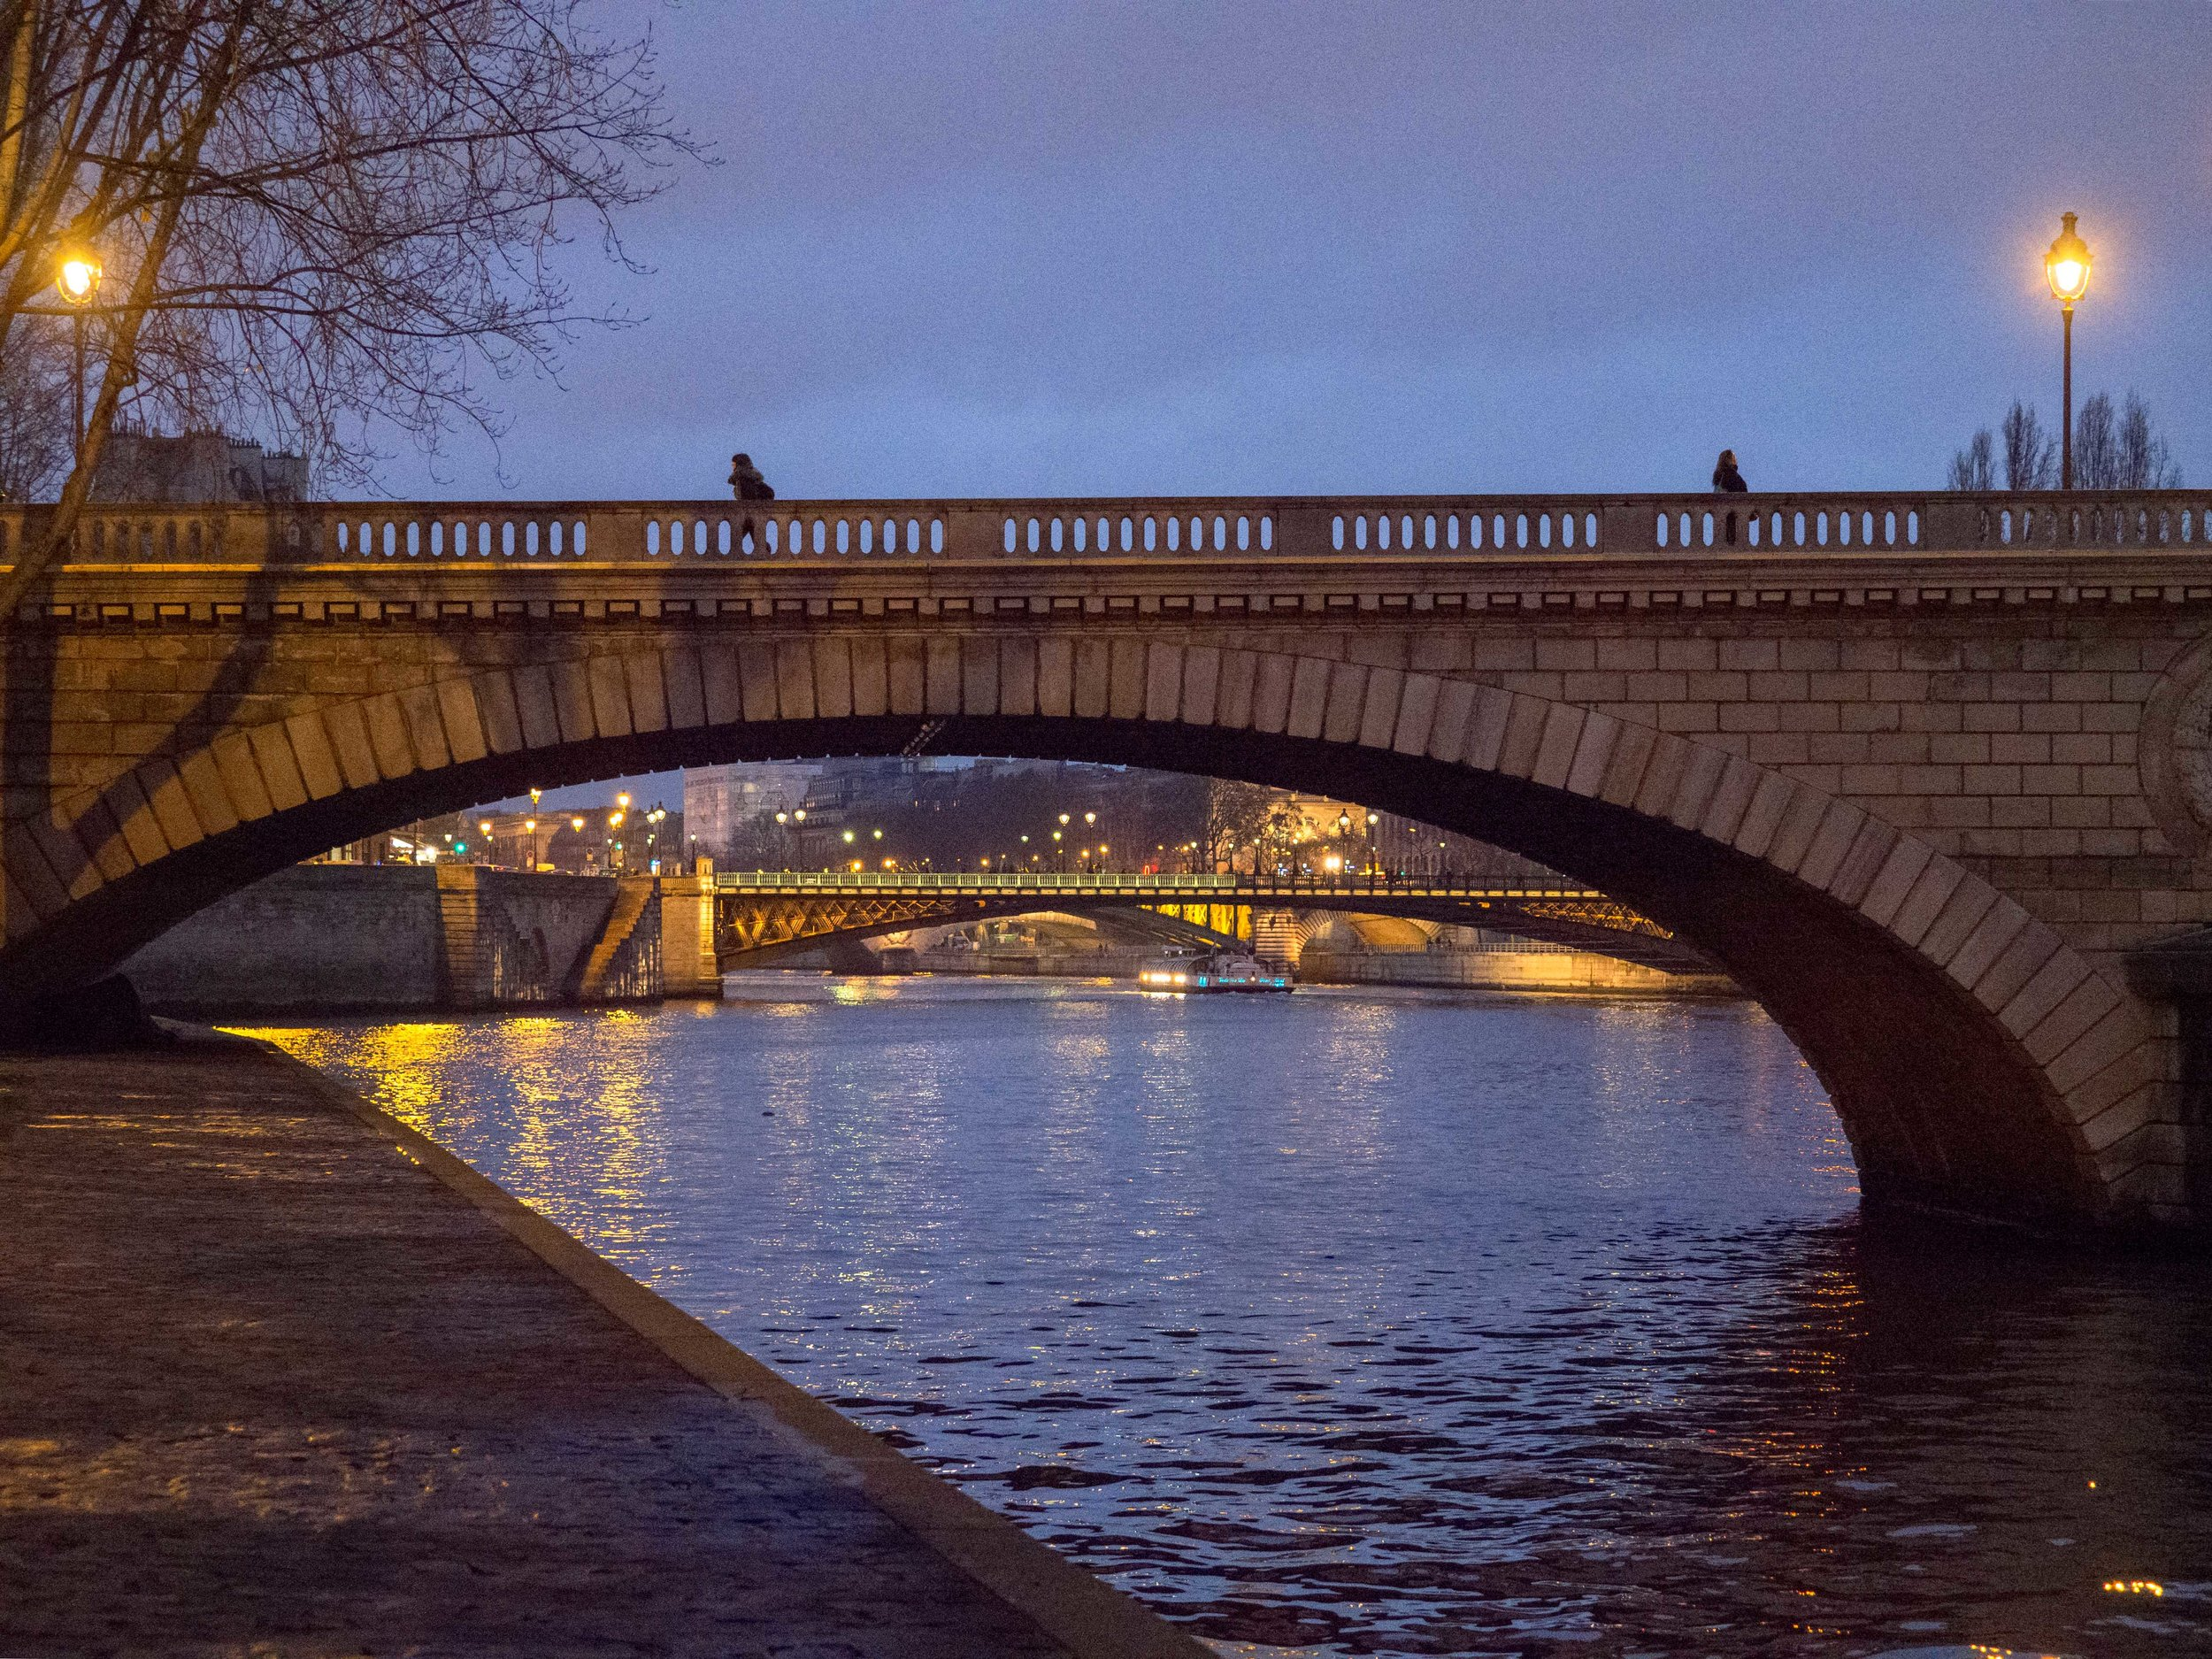 Double Bridge at Night